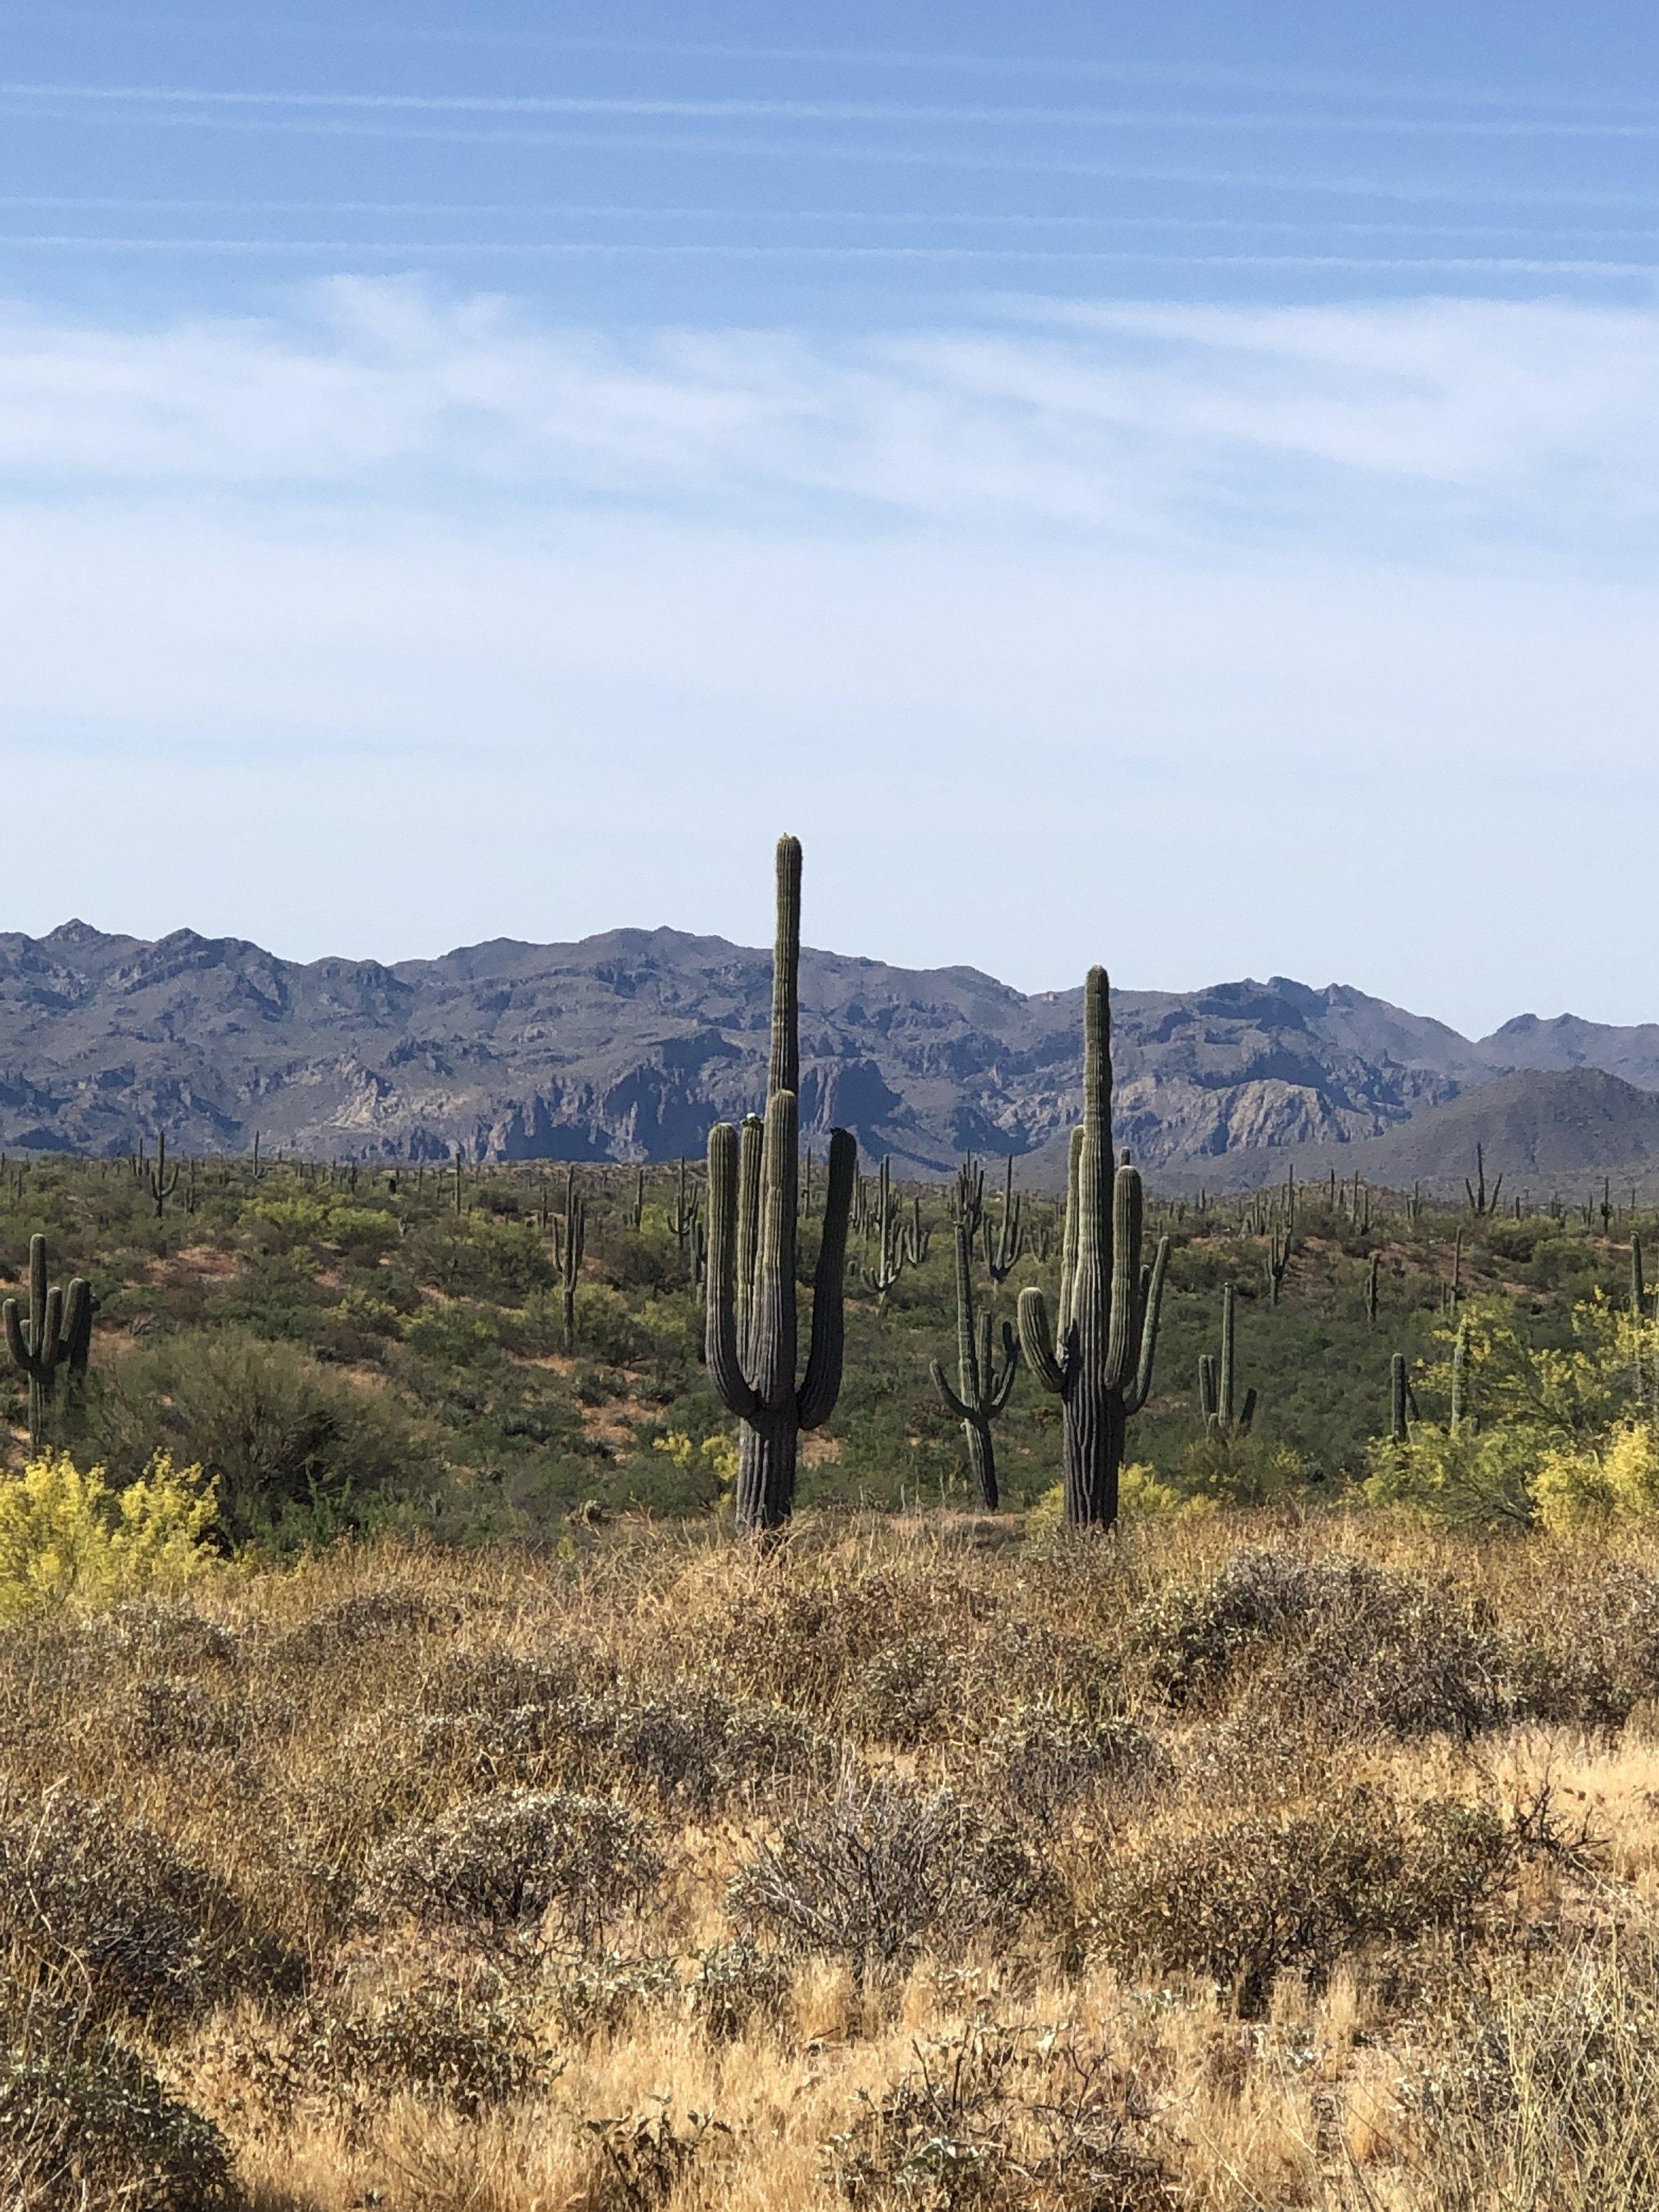 10ft + cacti. Incredible.